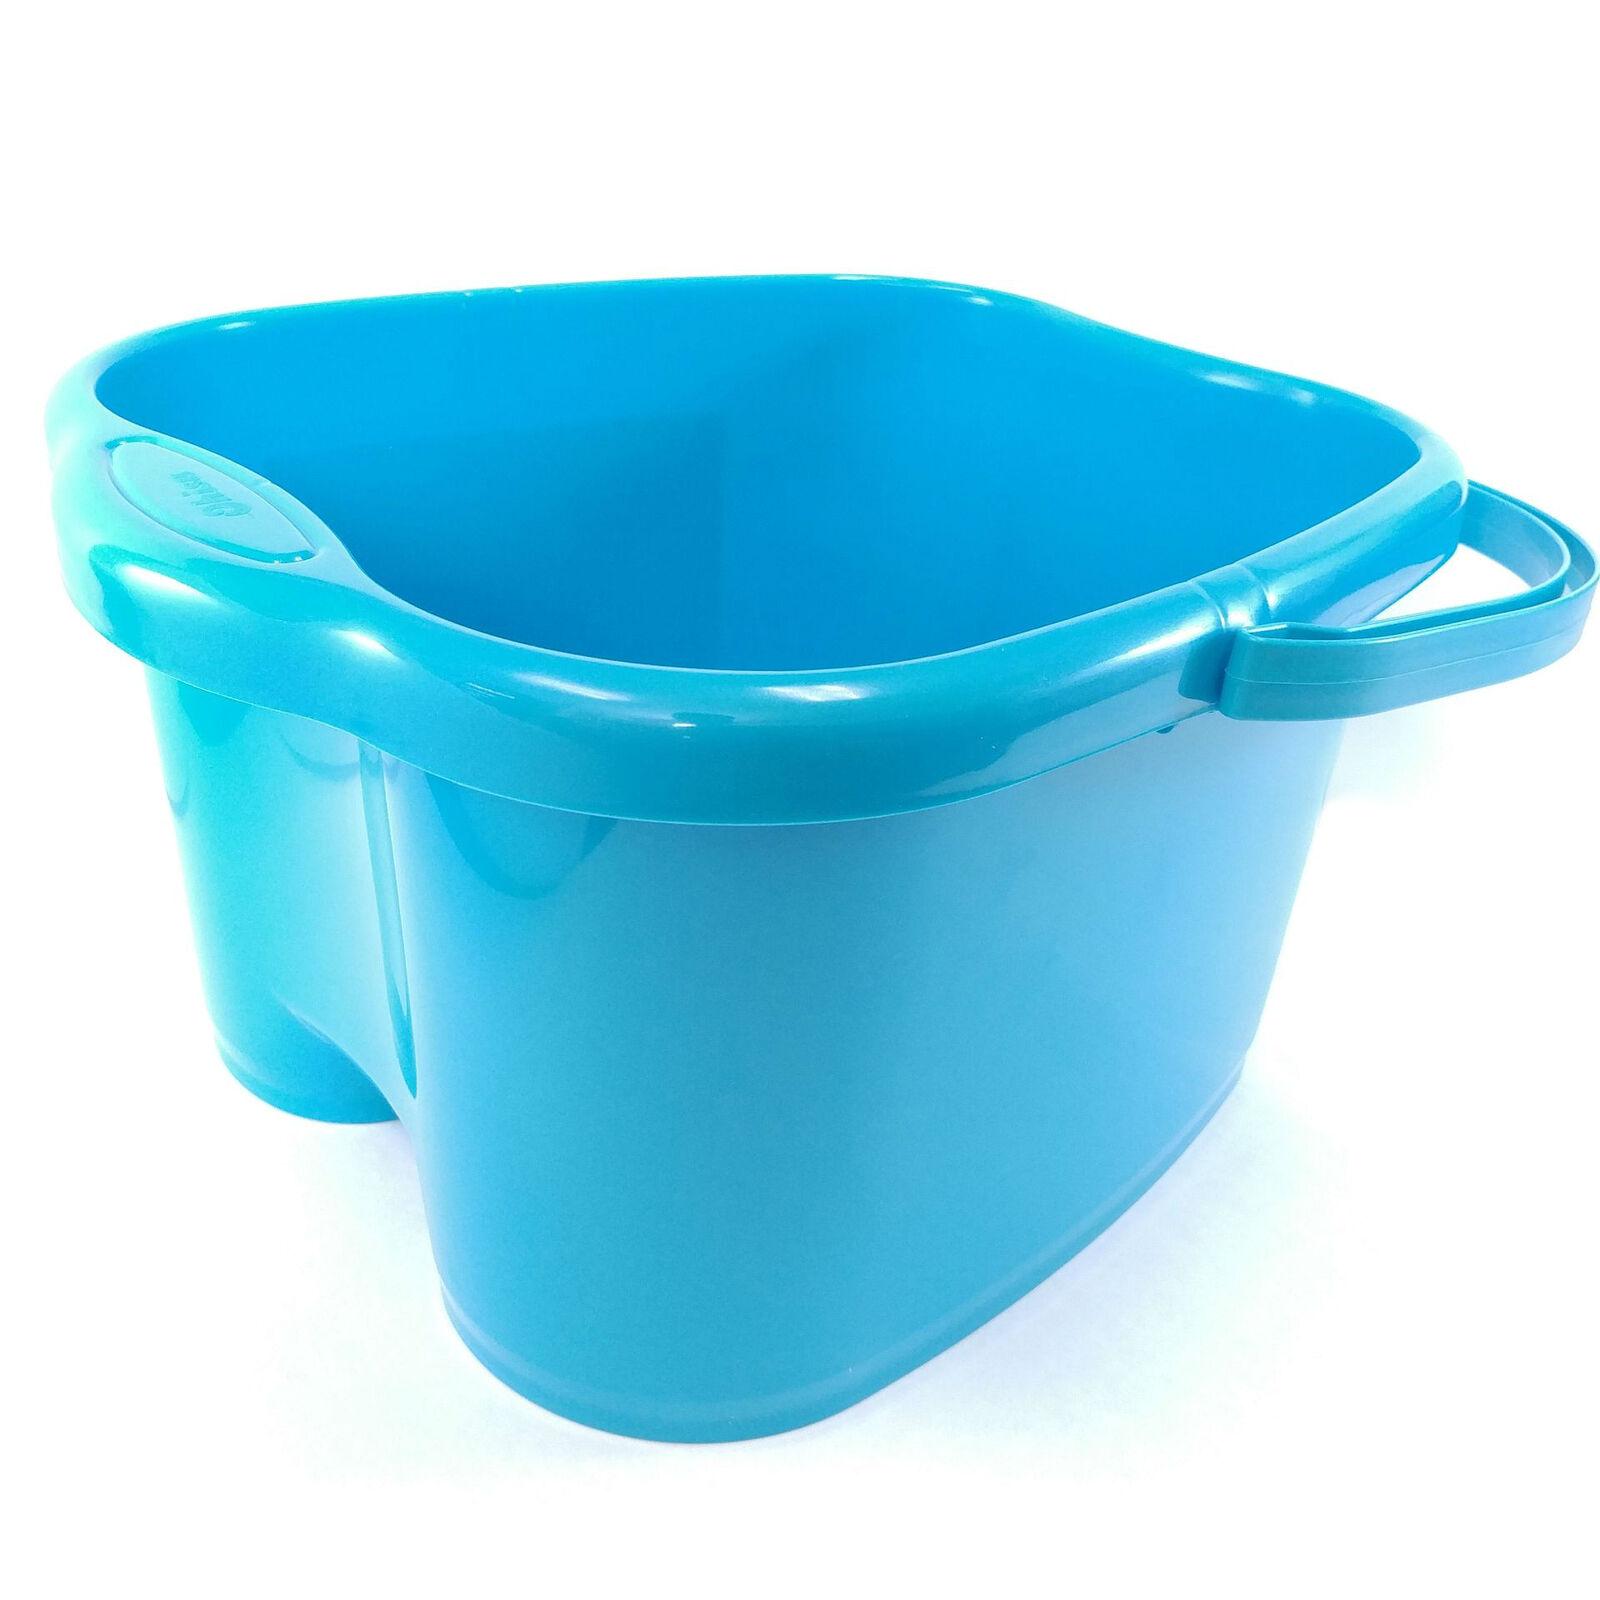 Ohisu Scrubs Salts Soaks Blue Foot Basin for Bath Soak or Detox ...